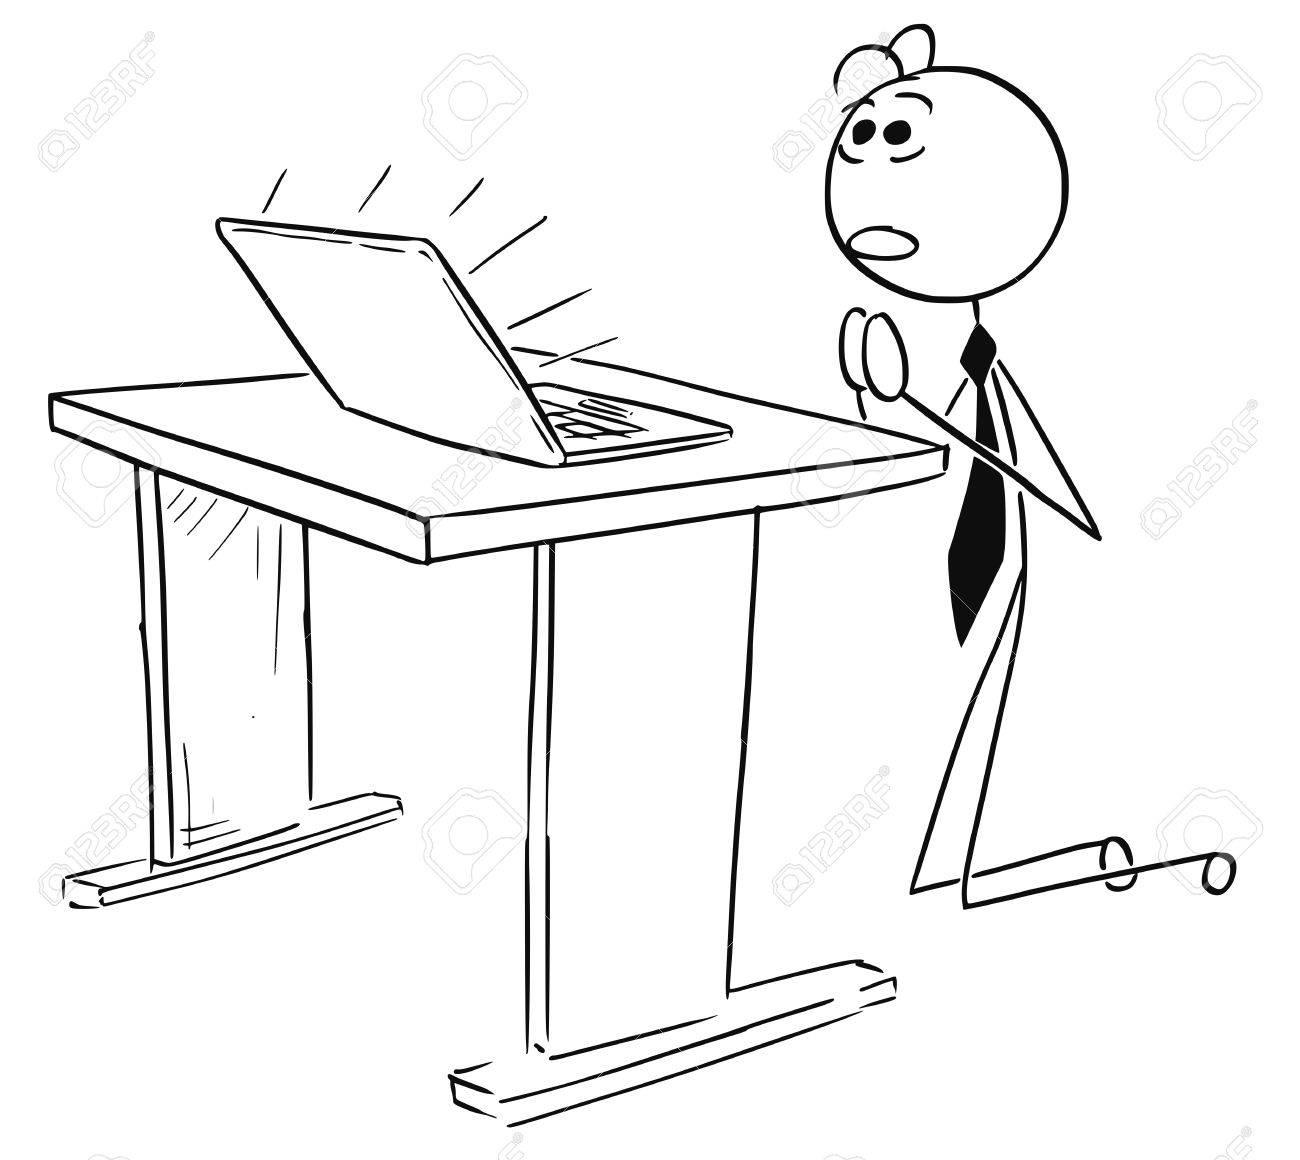 1300x1160 Cartoon Vector Stick Man Illustration Of Businessman Kneeling